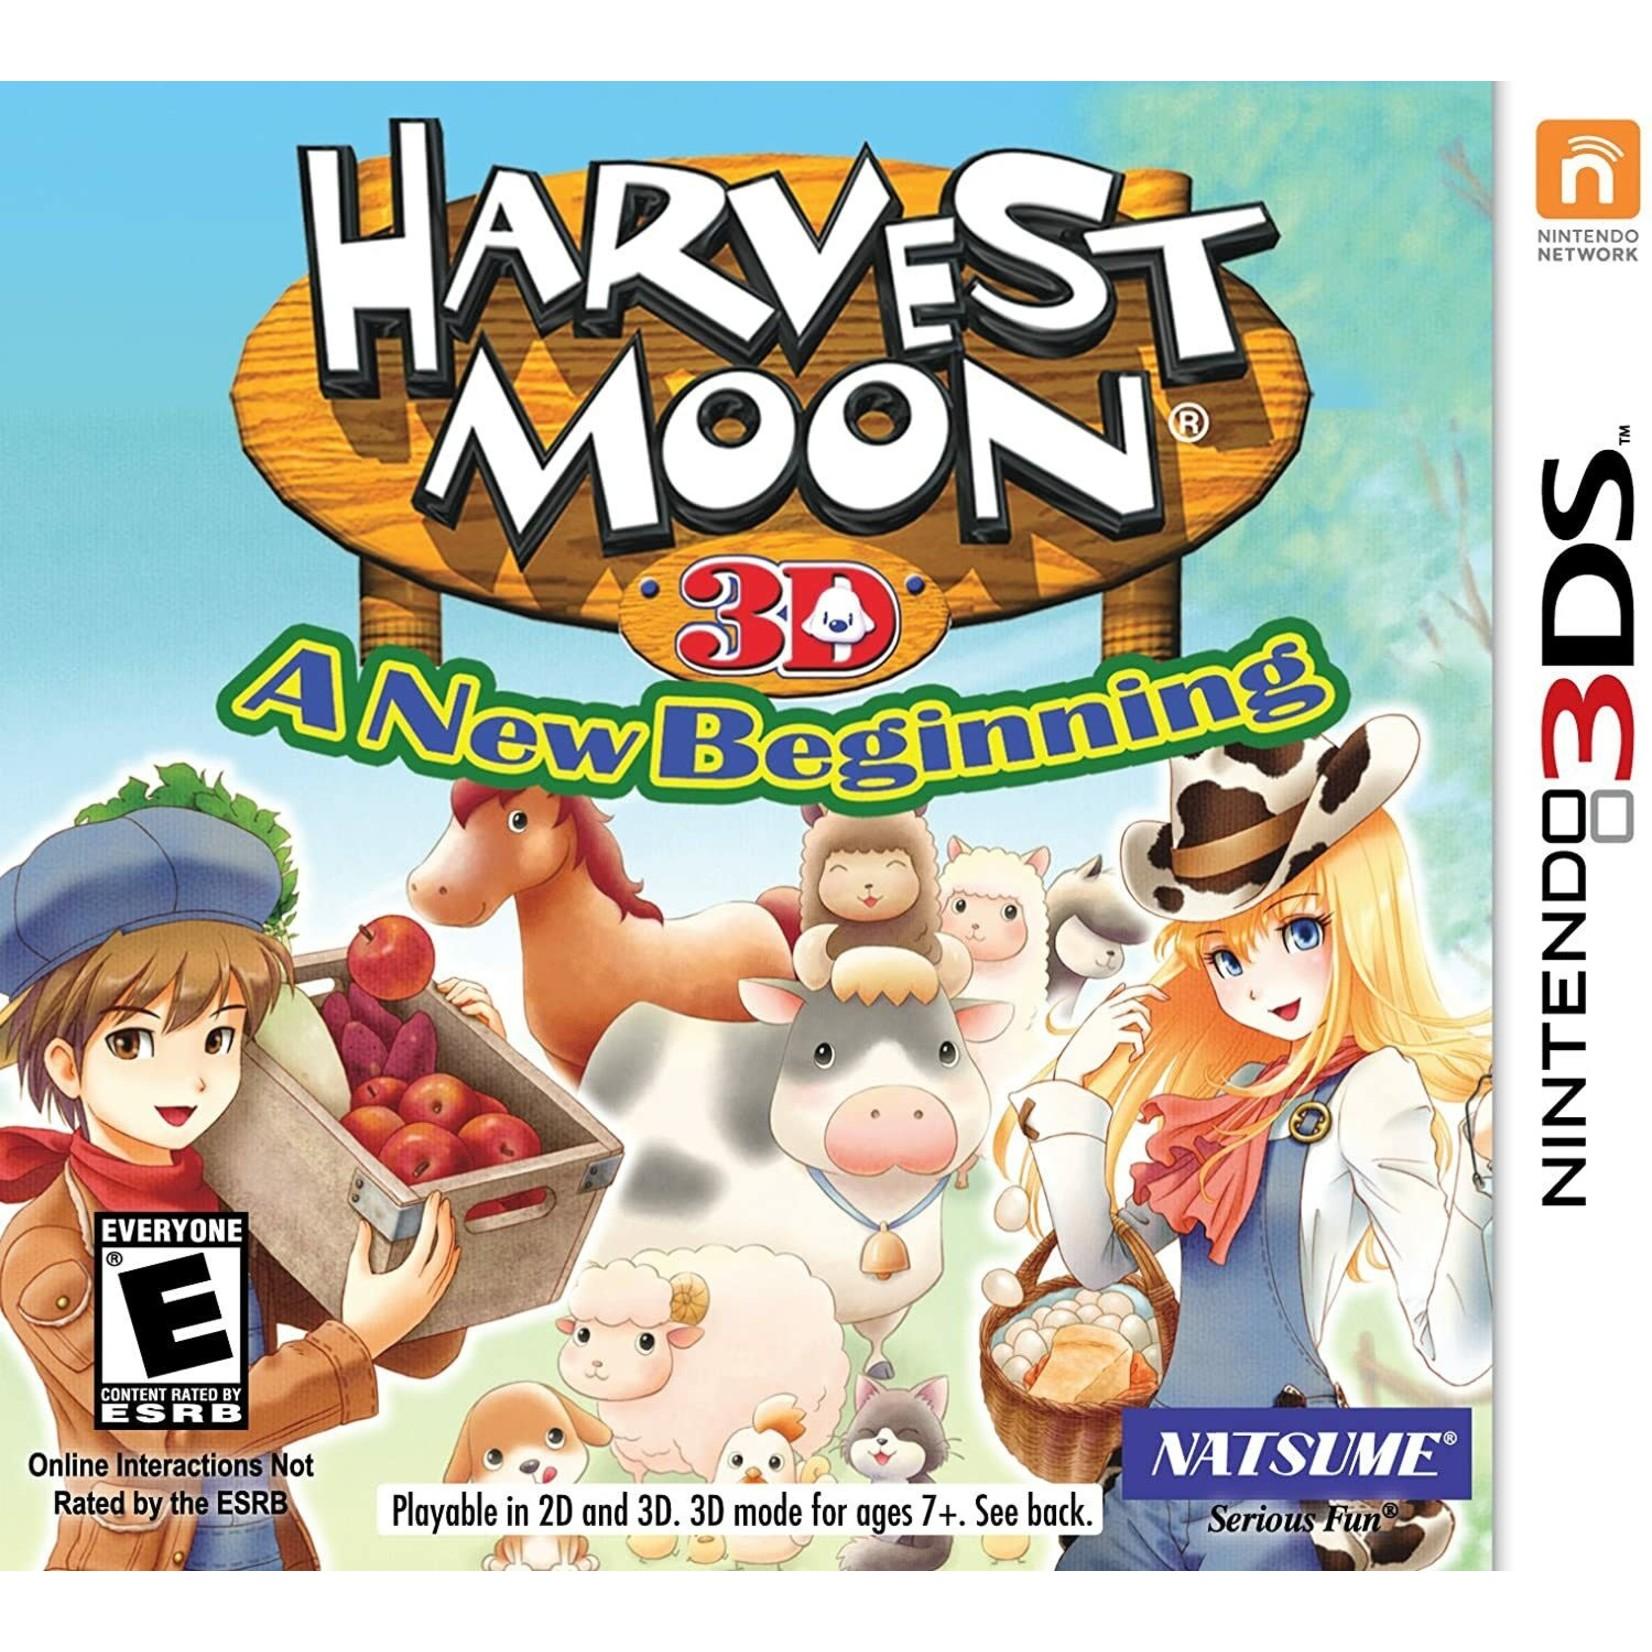 3DS-Harvest Moon: A New Beginning